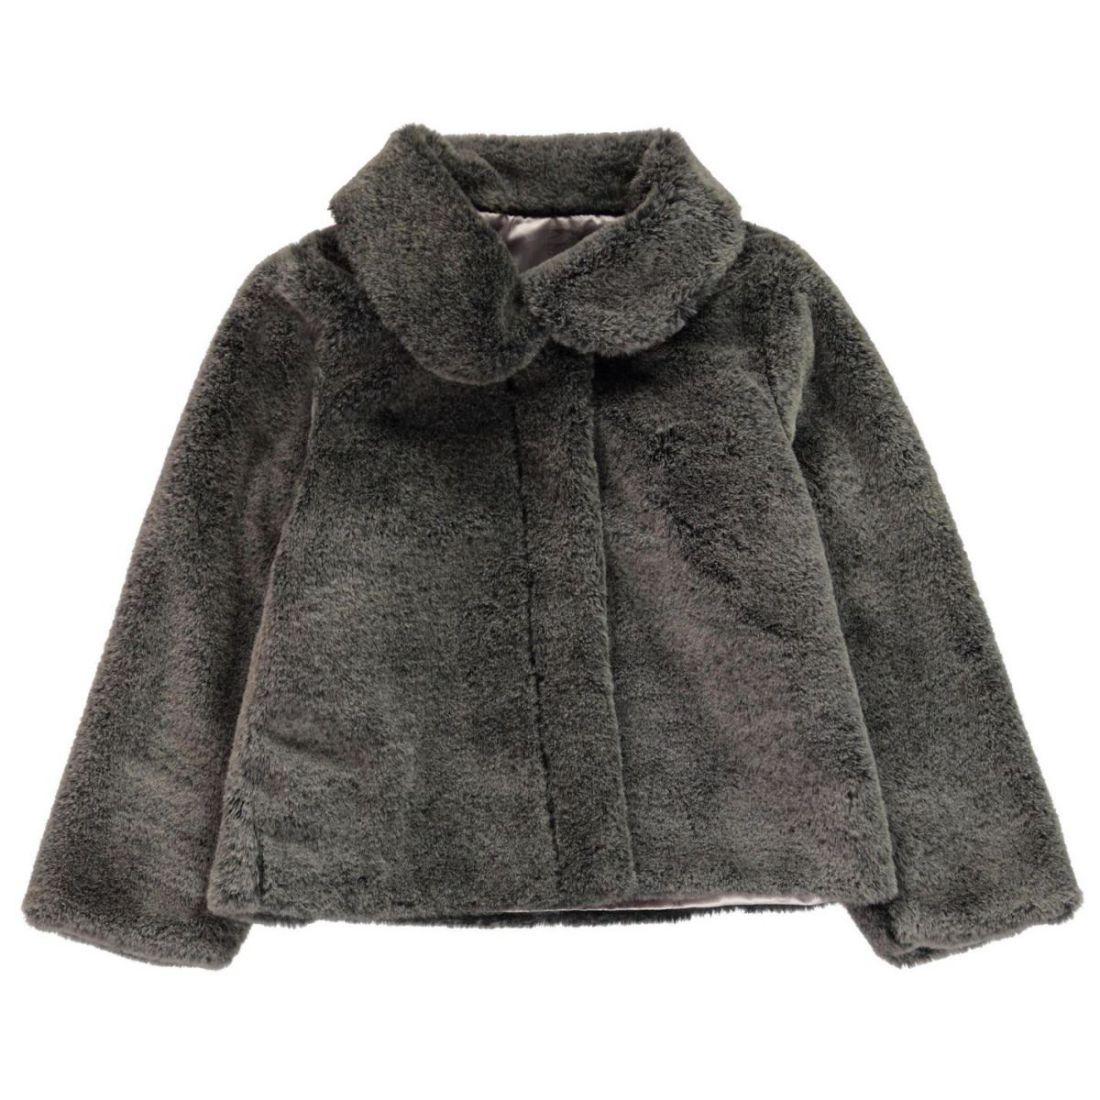 a924a7cb20 Character Kids Girls Fur Coat Infant Faux Top Jacket Long Sleeve ...